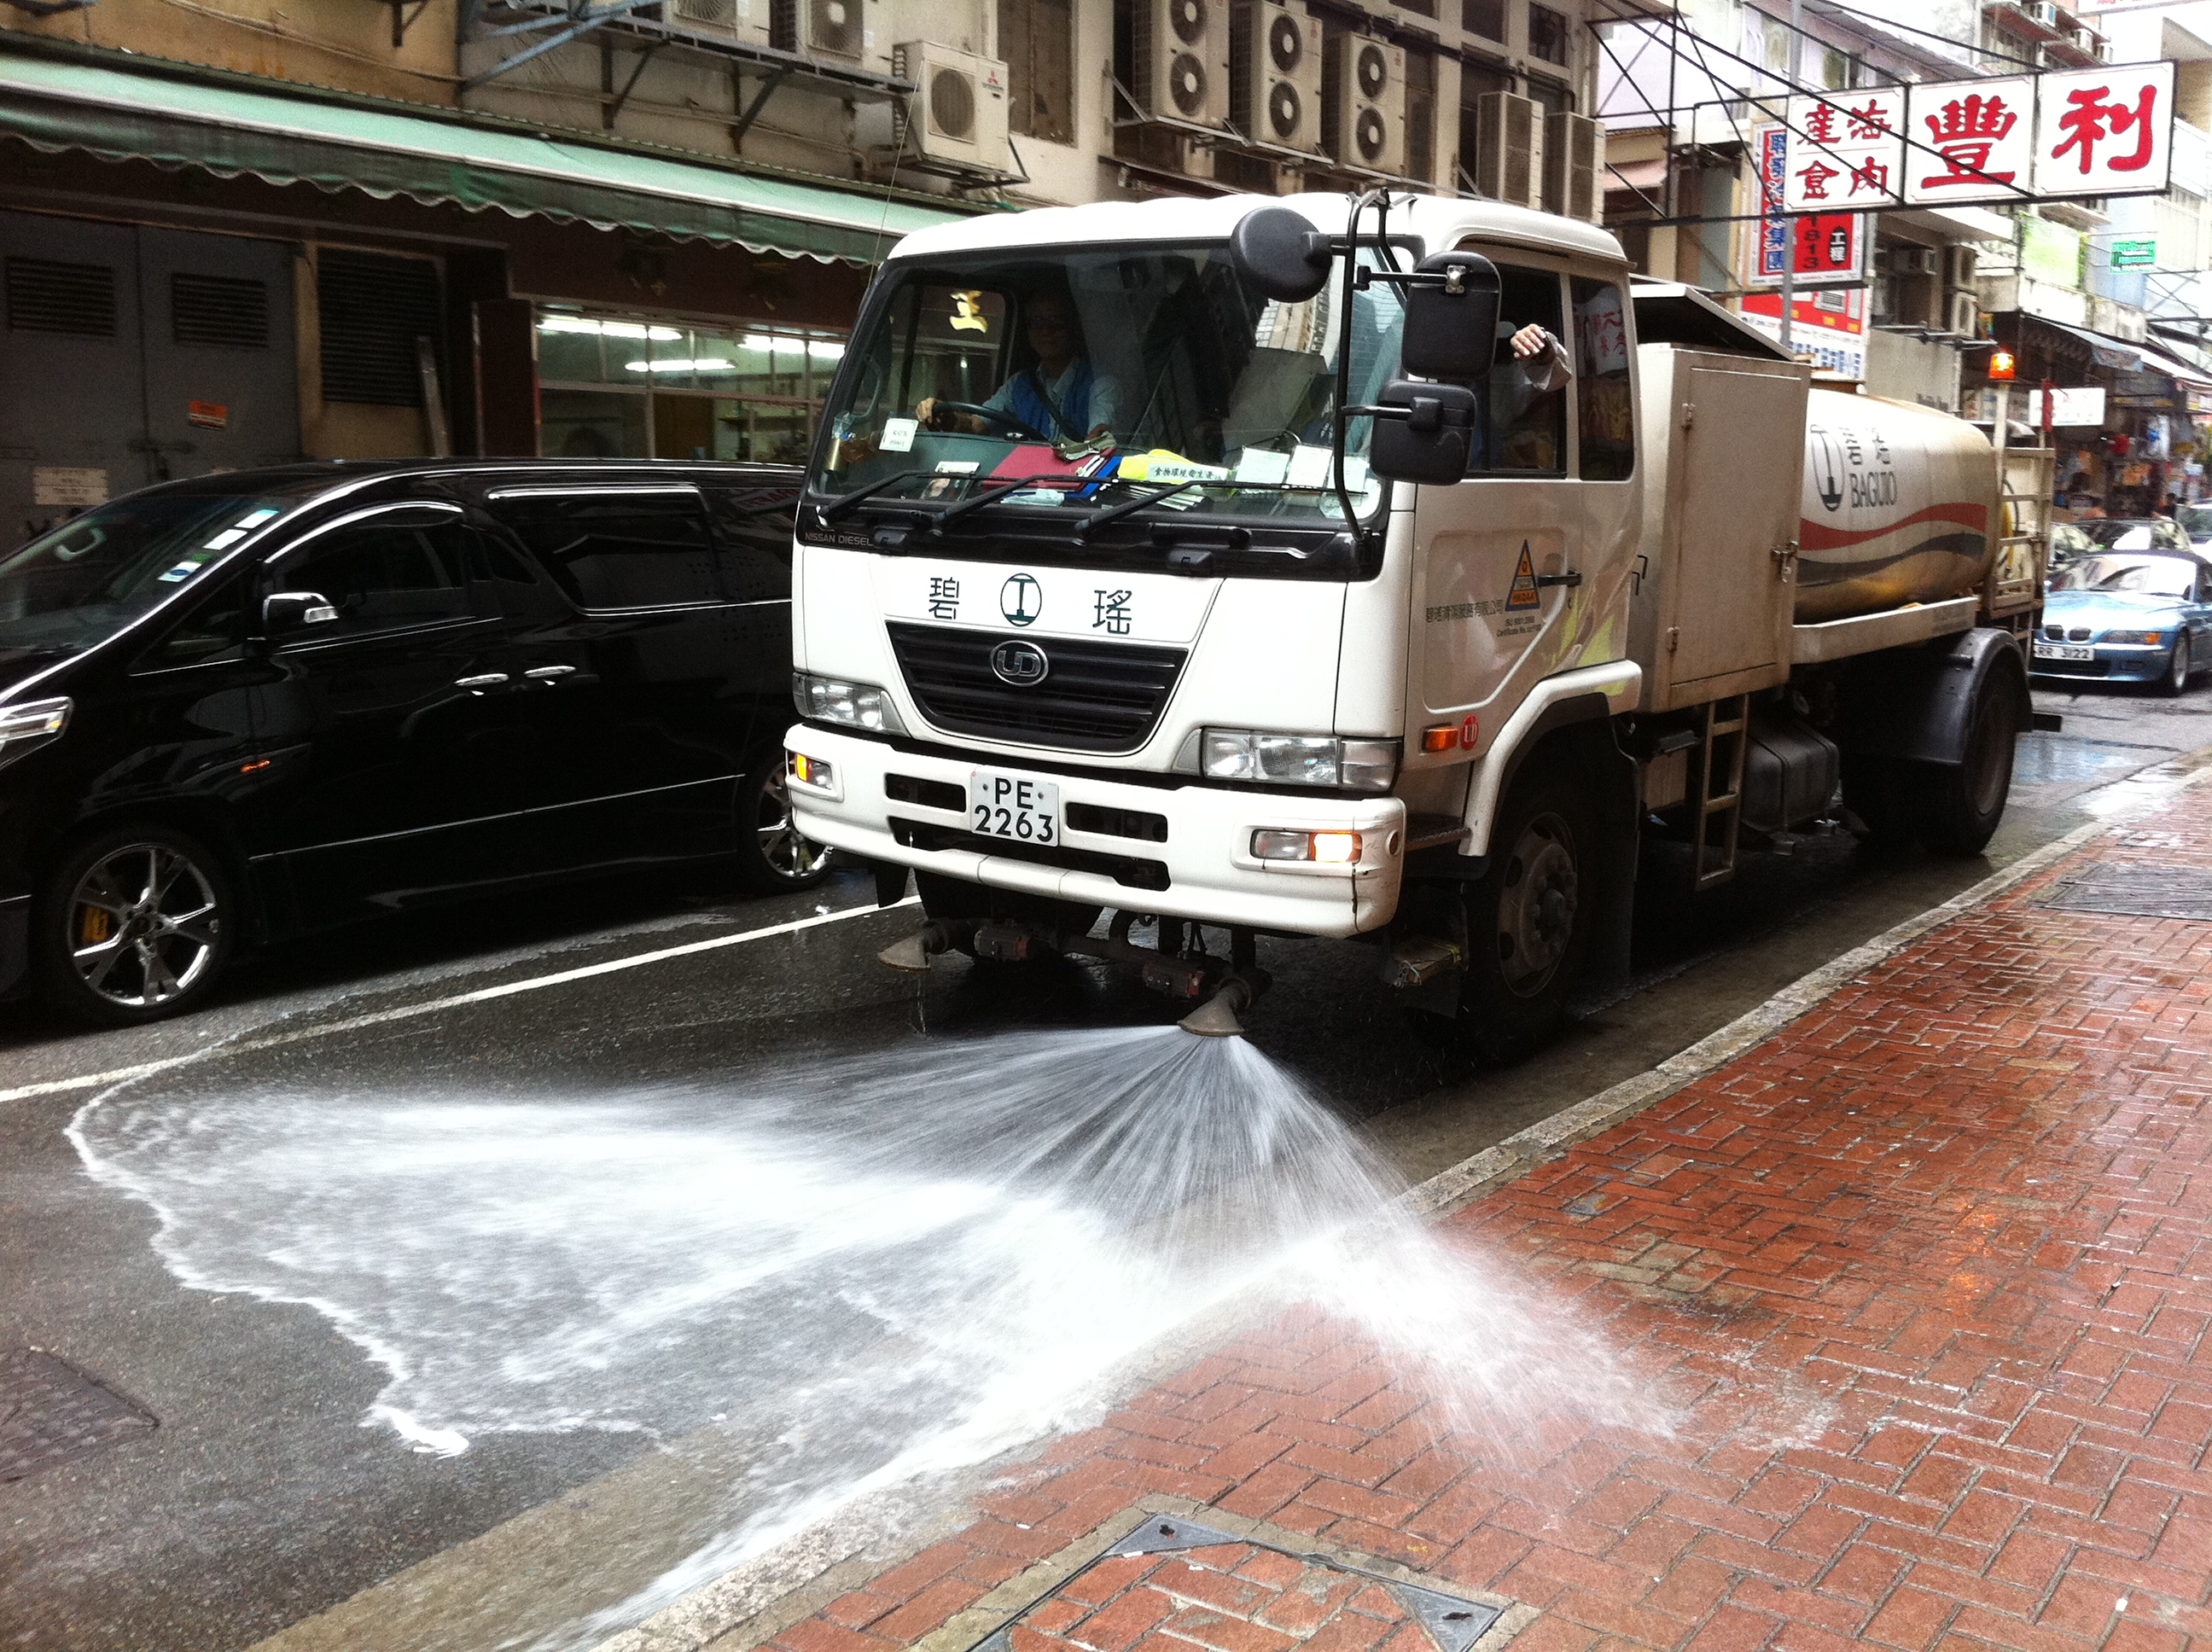 Car Under Spray Paint With Waxol